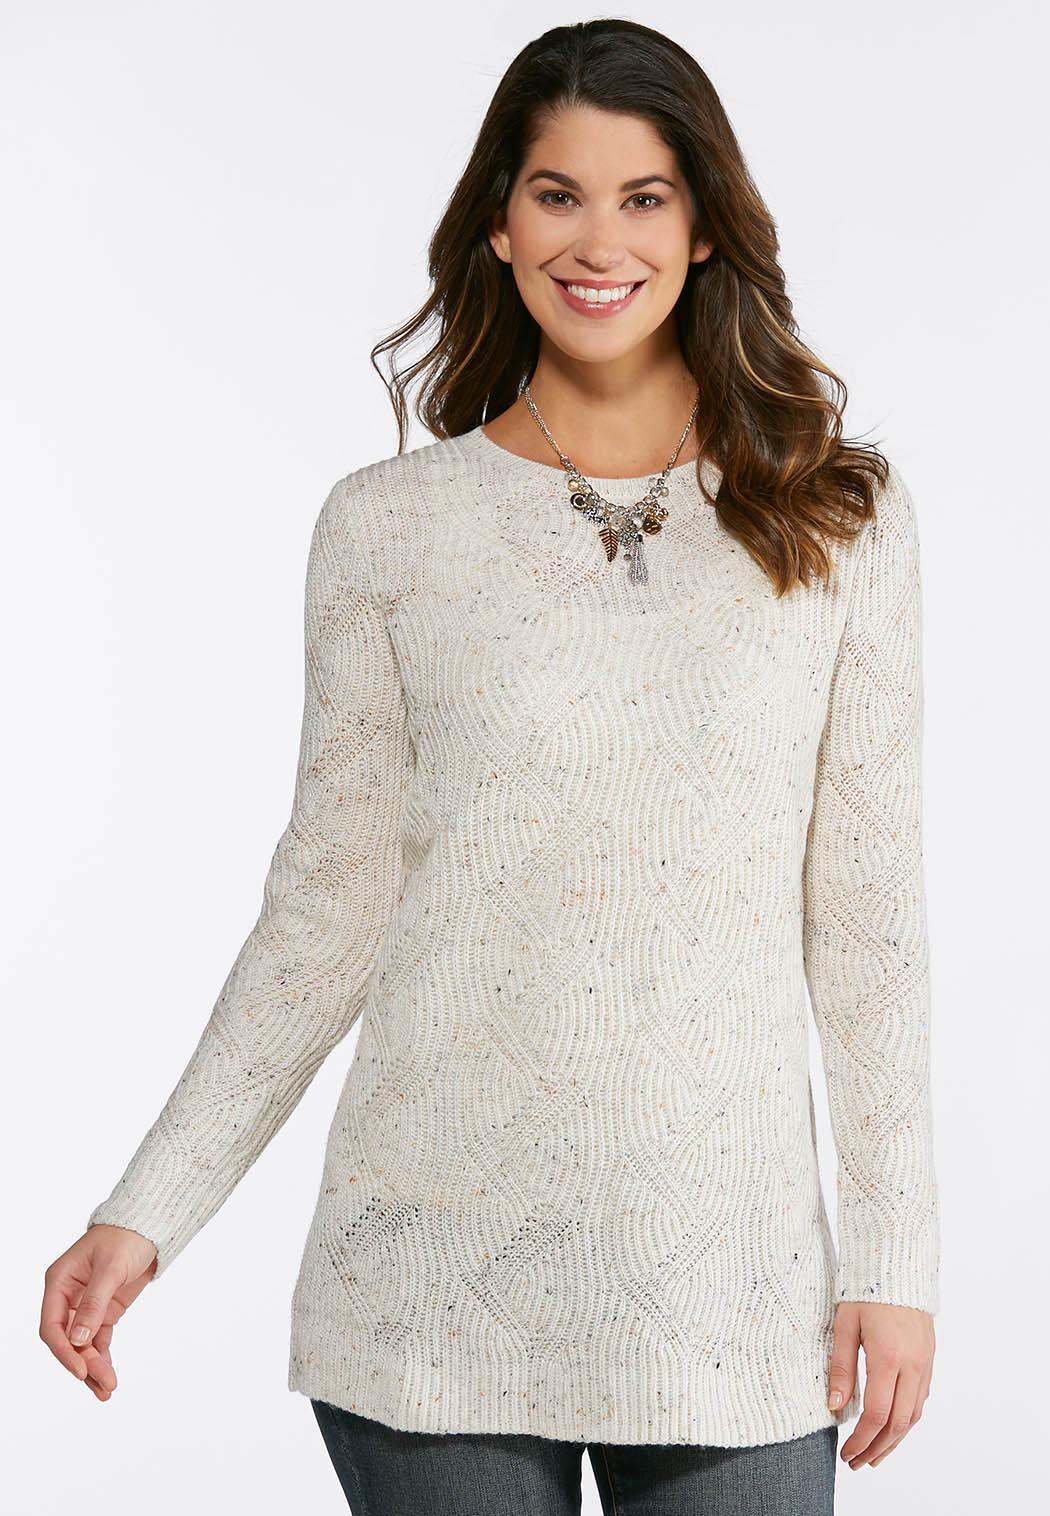 010316b99e9 Women s Plus Size Pullovers